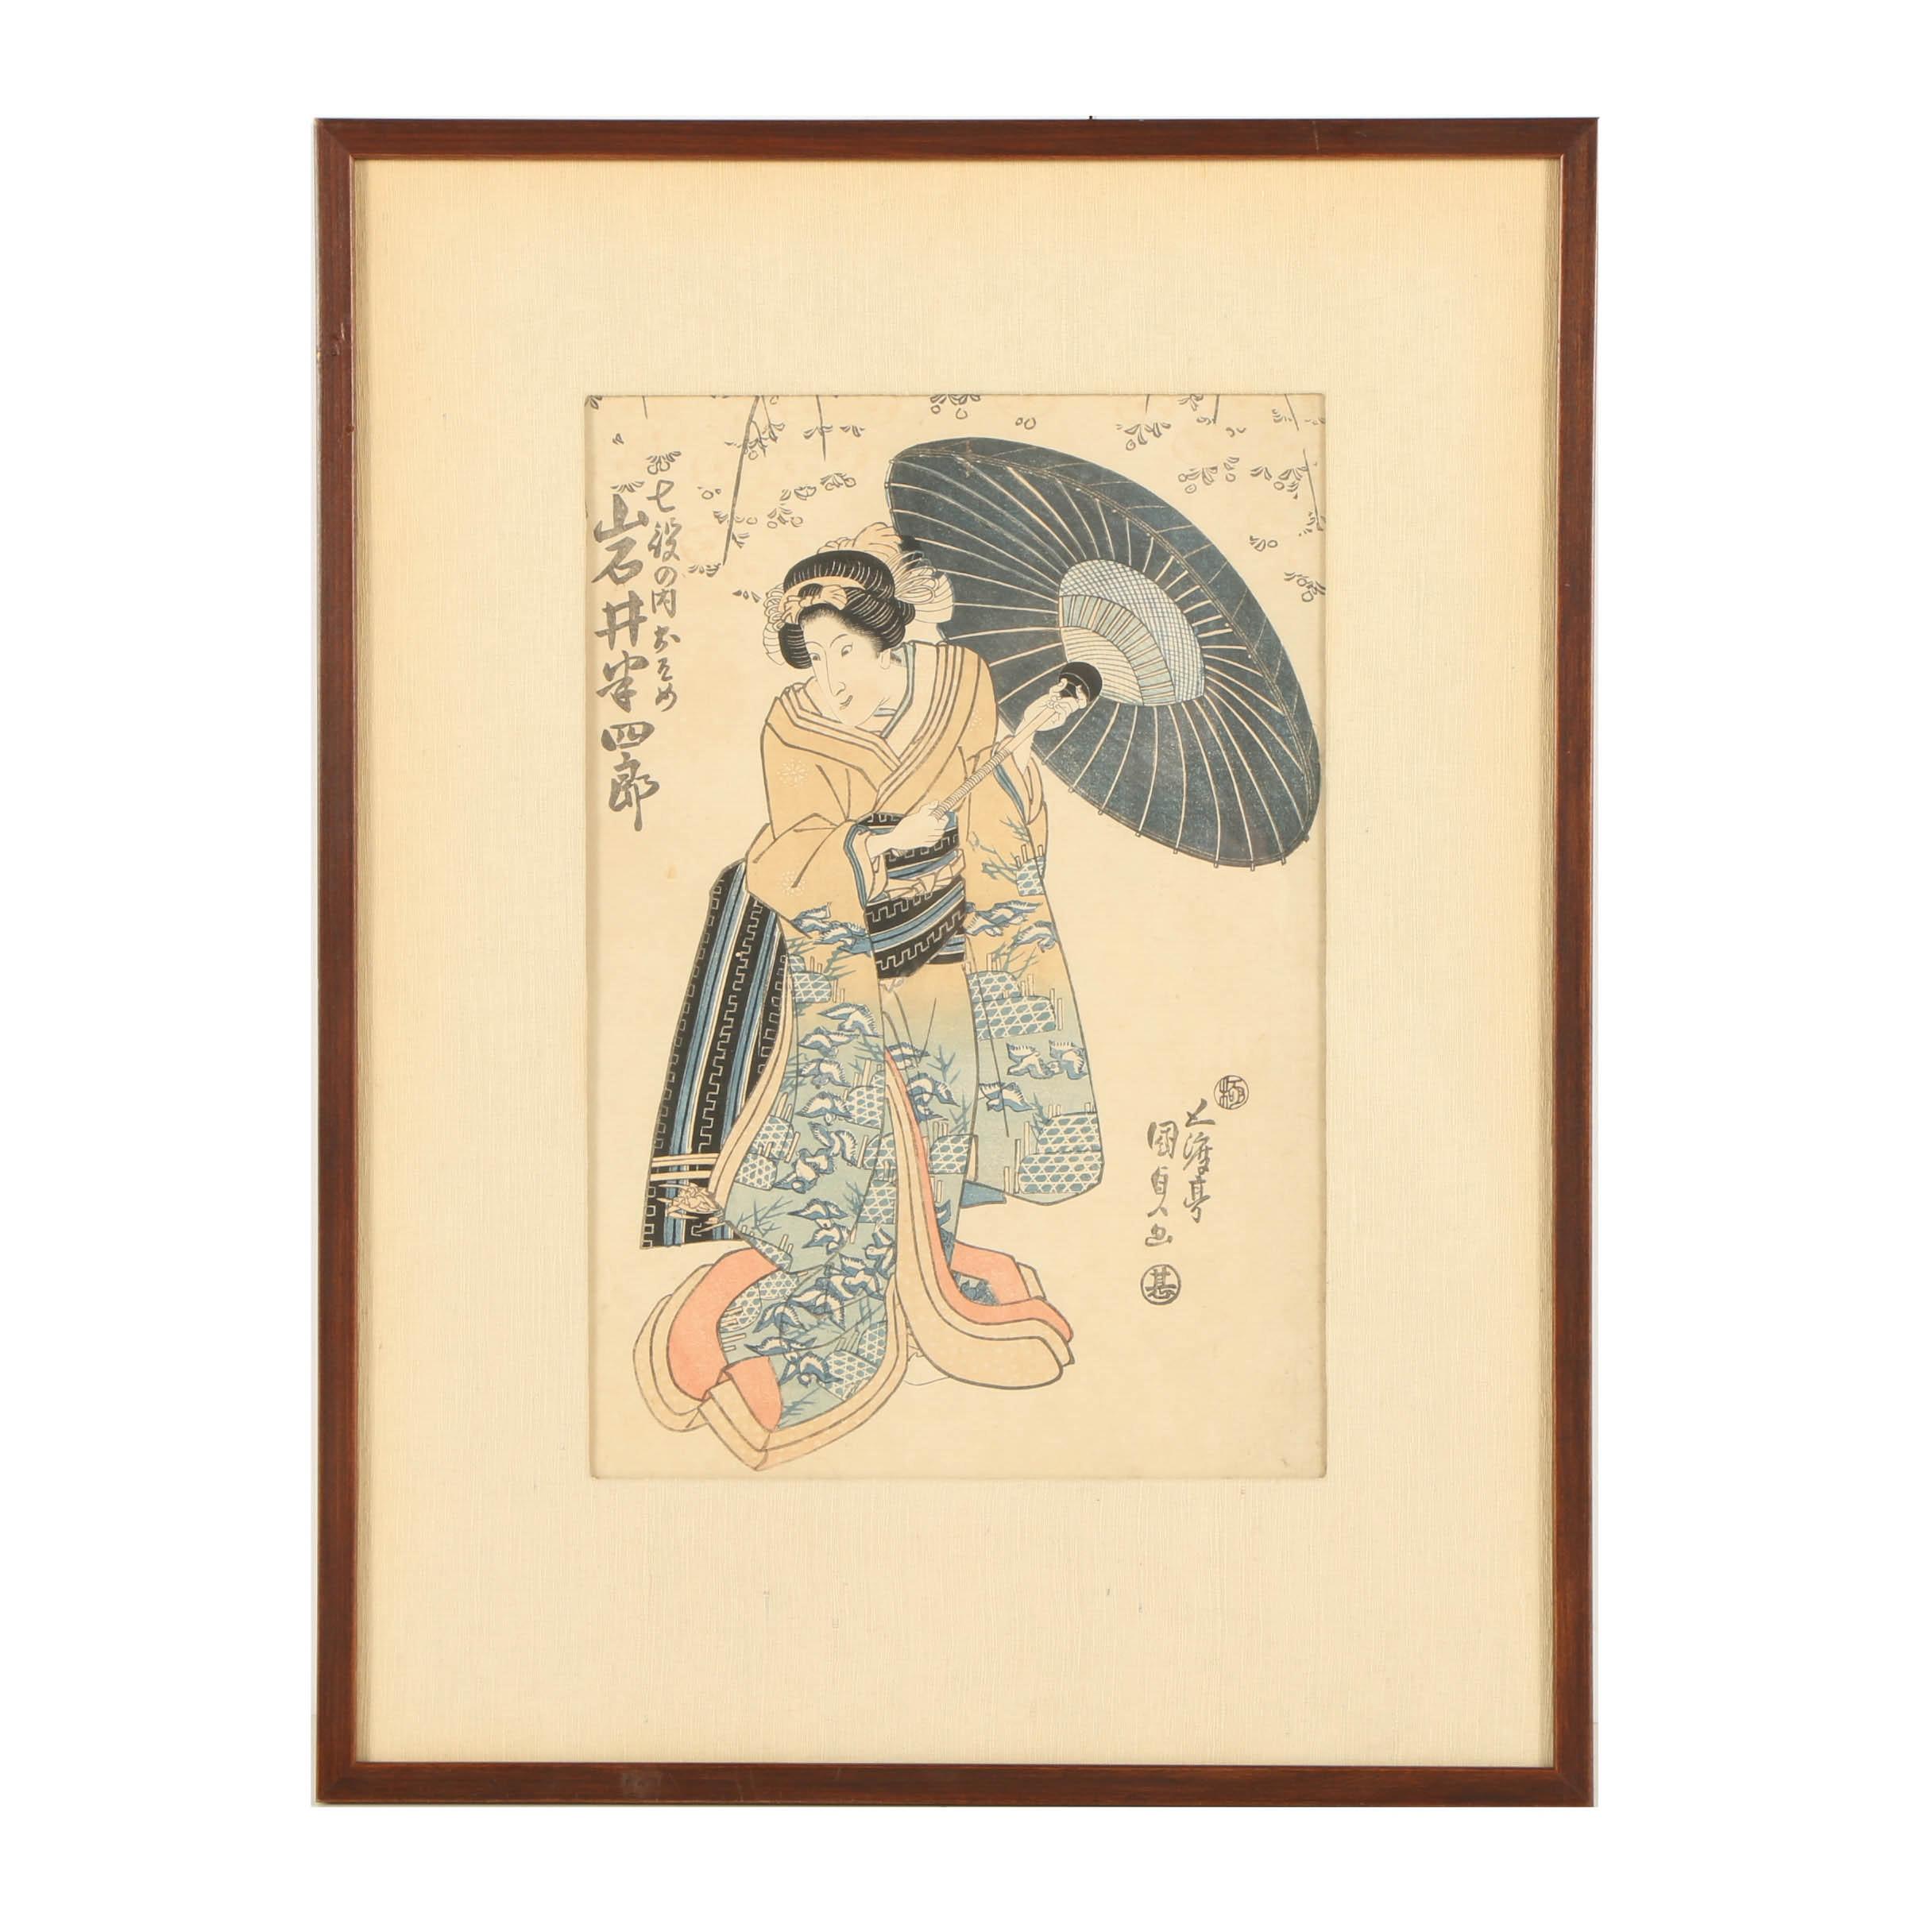 "Utagawa Kunisda Woodblock Print on Paper of ""Seven Roles of Hanshiro Iwai"""